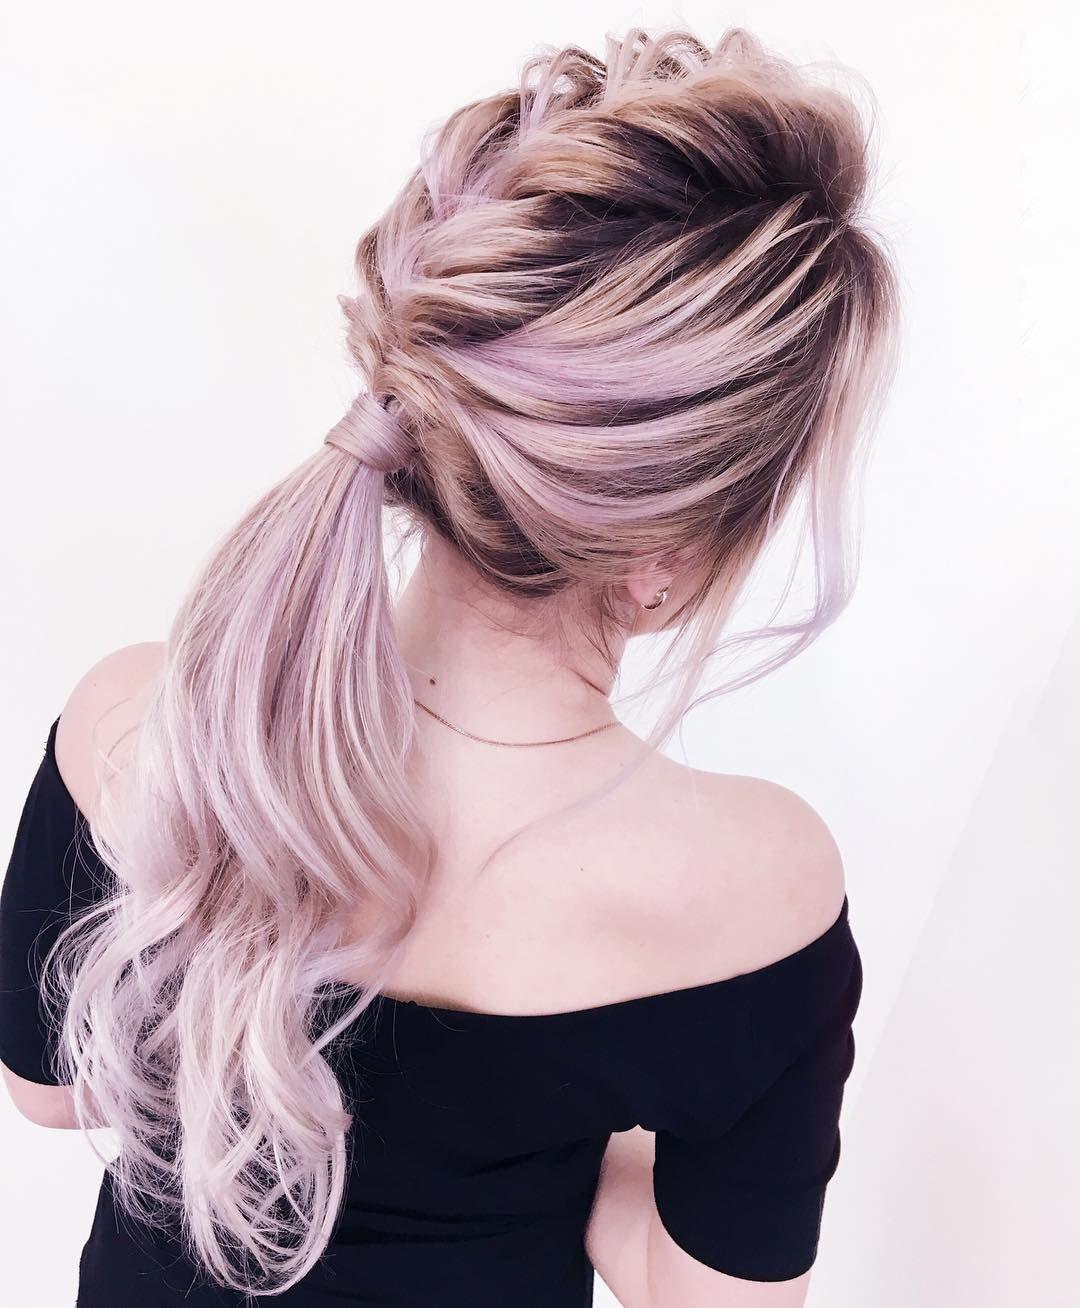 Beautiful hairstyle inspiration